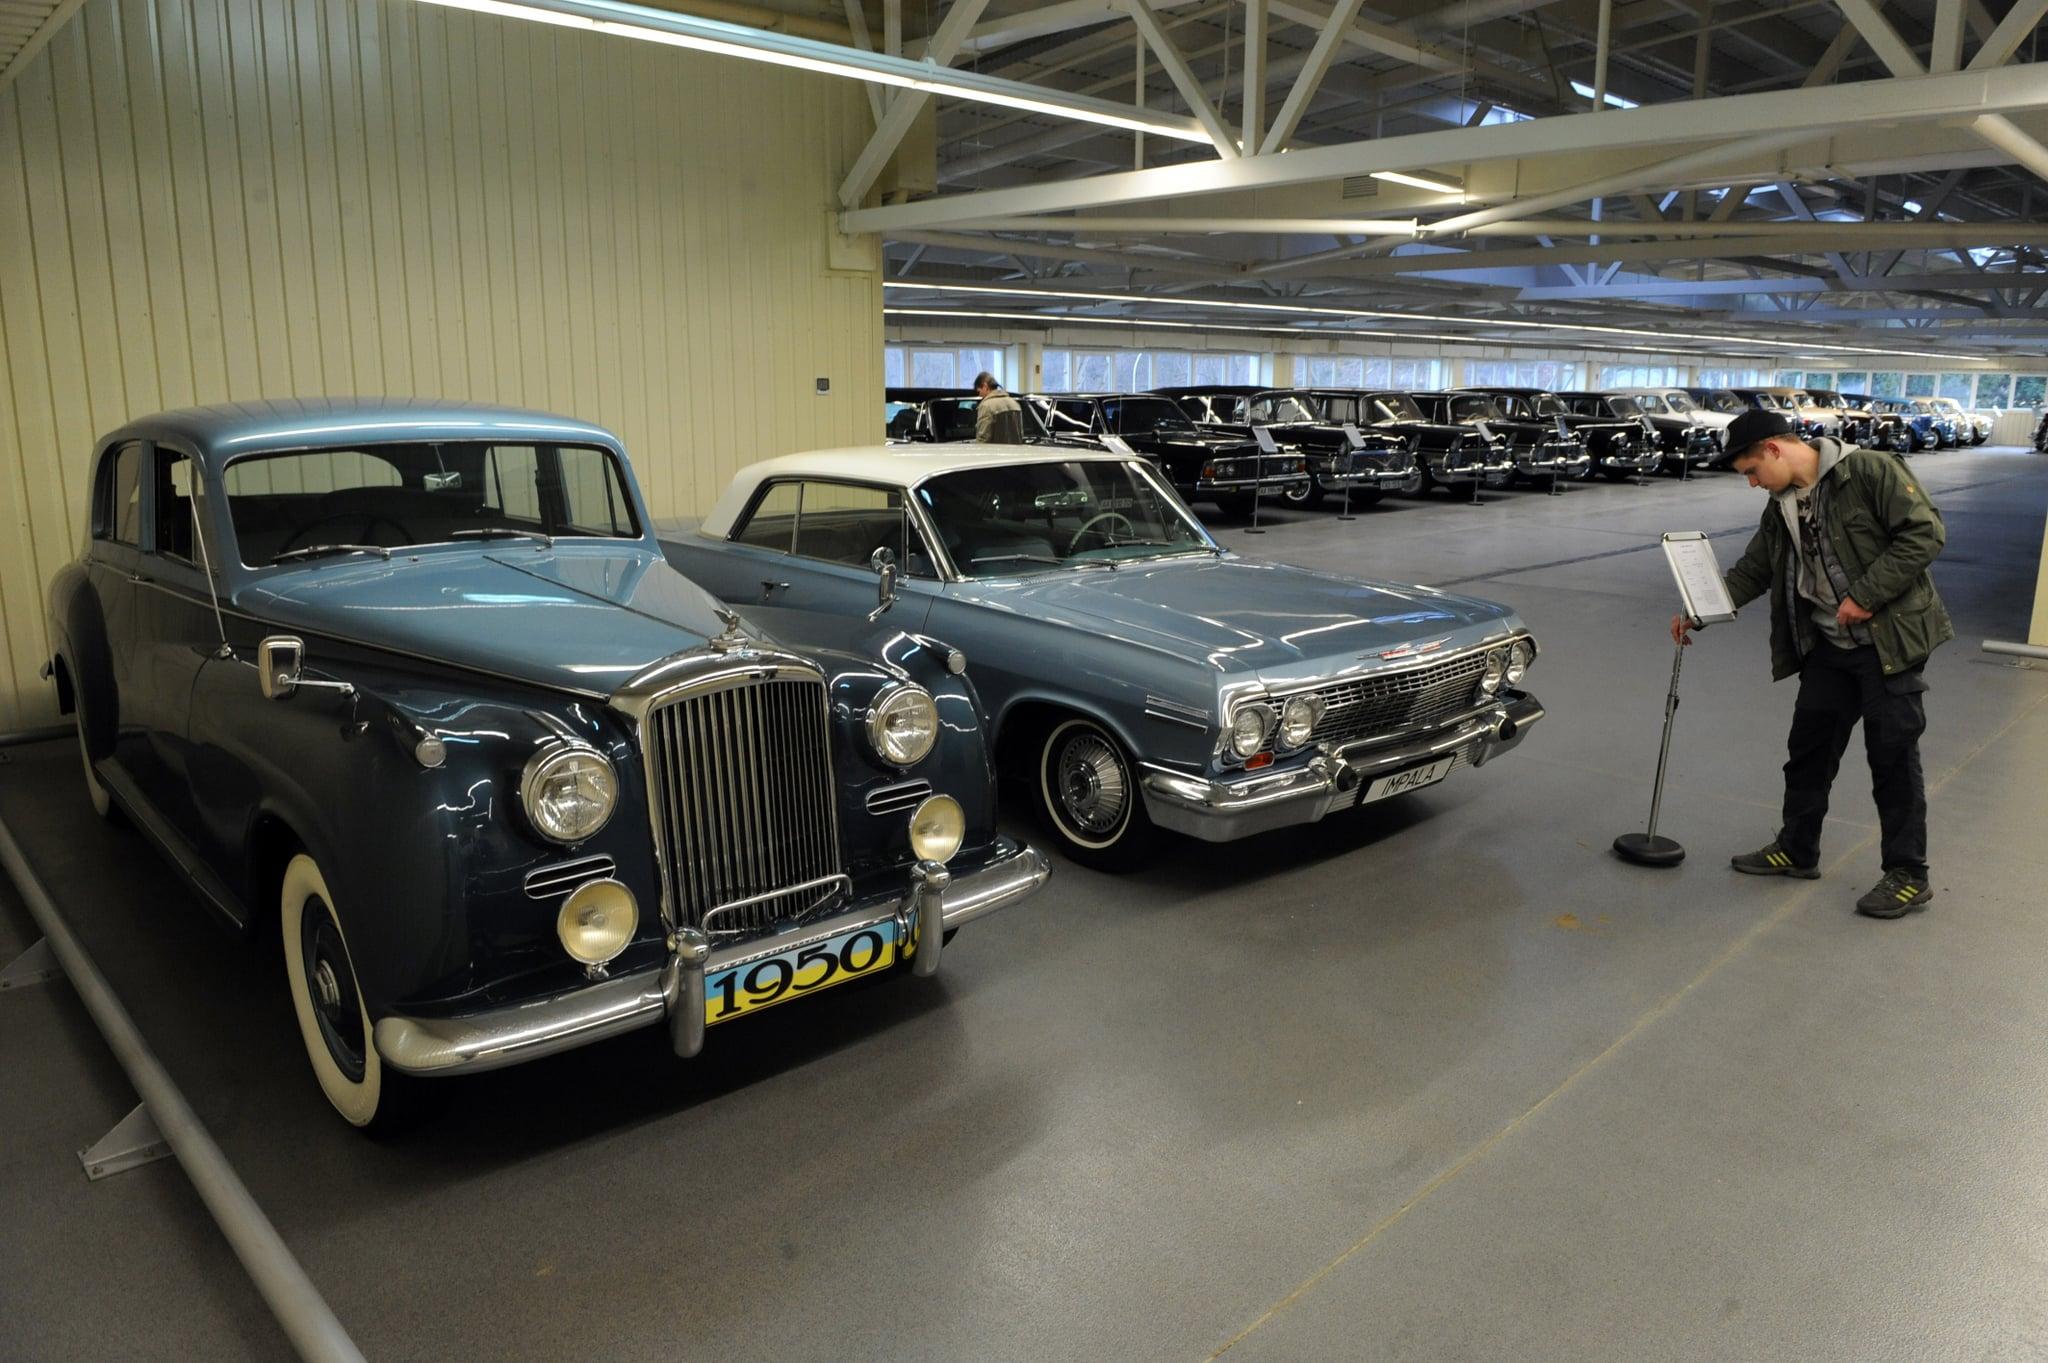 Vintage cars lined a giant garage.